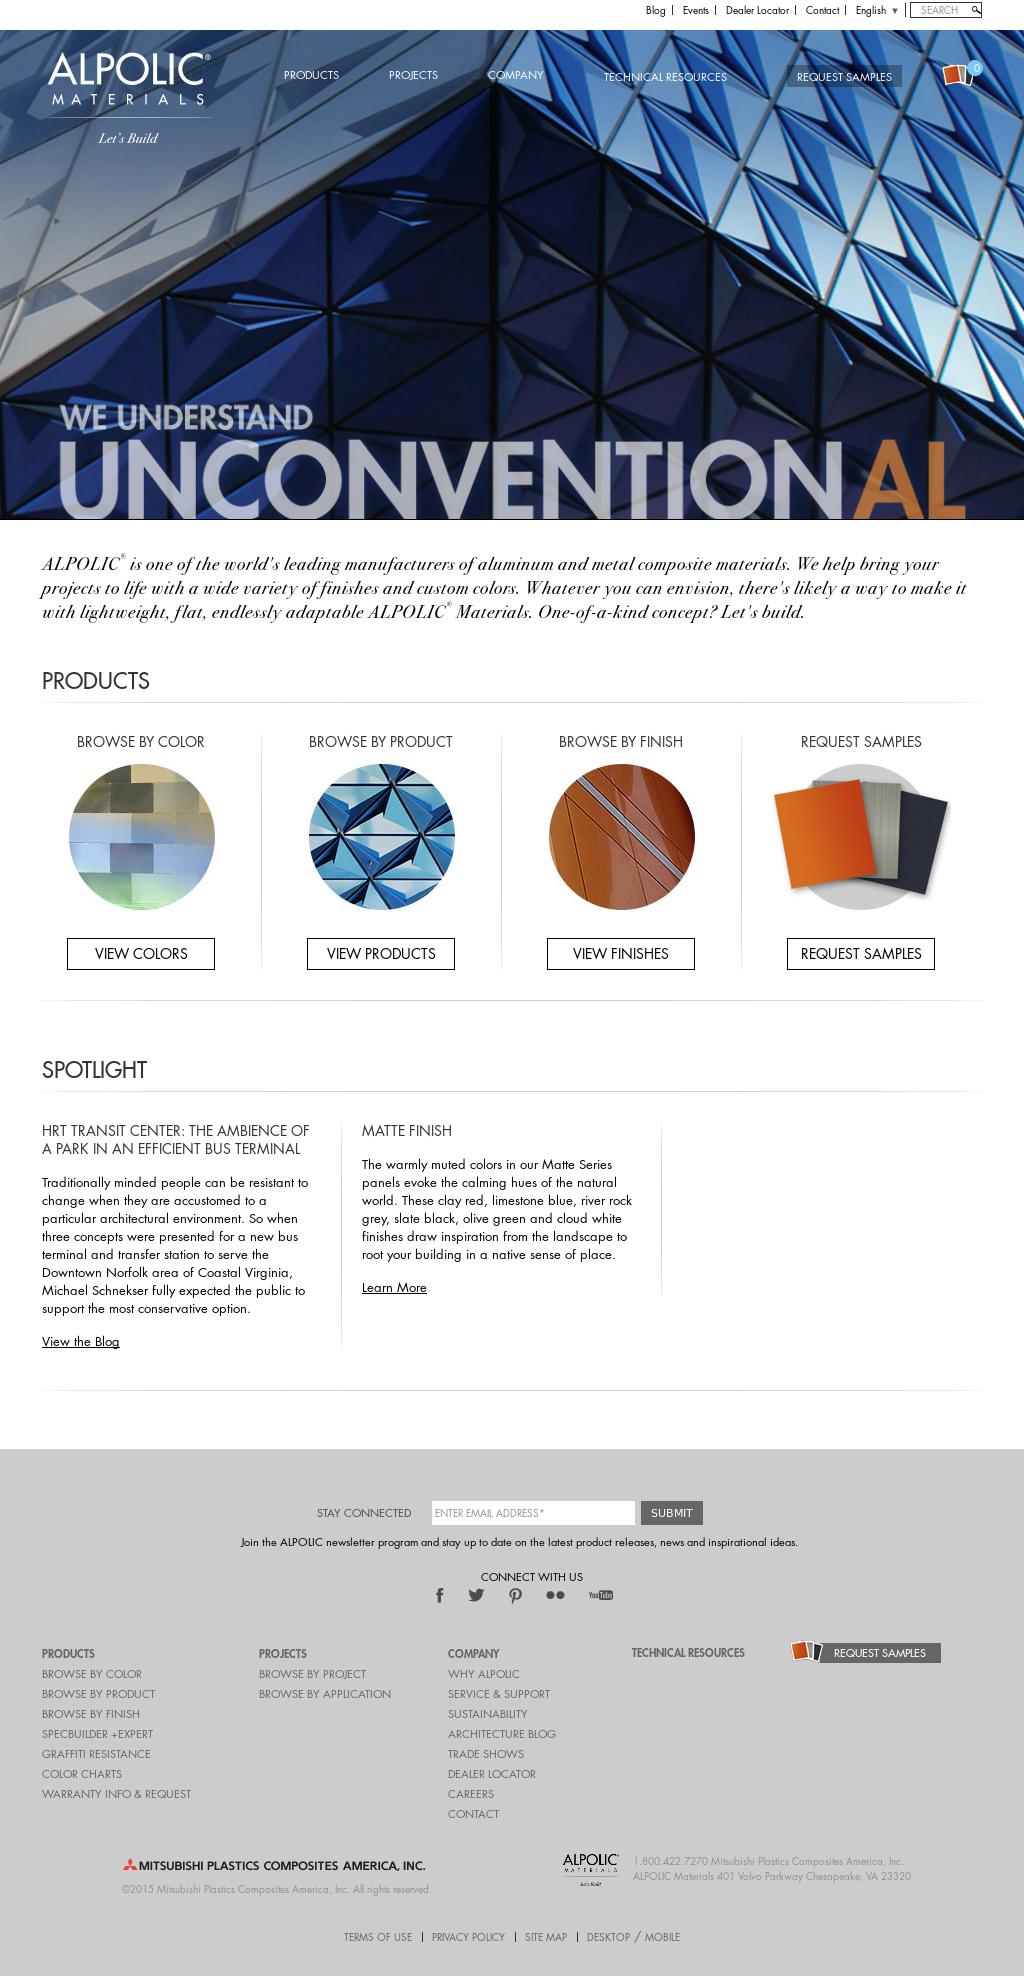 ALPOLIC Competitors, Revenue and Employees - Owler Company Profile